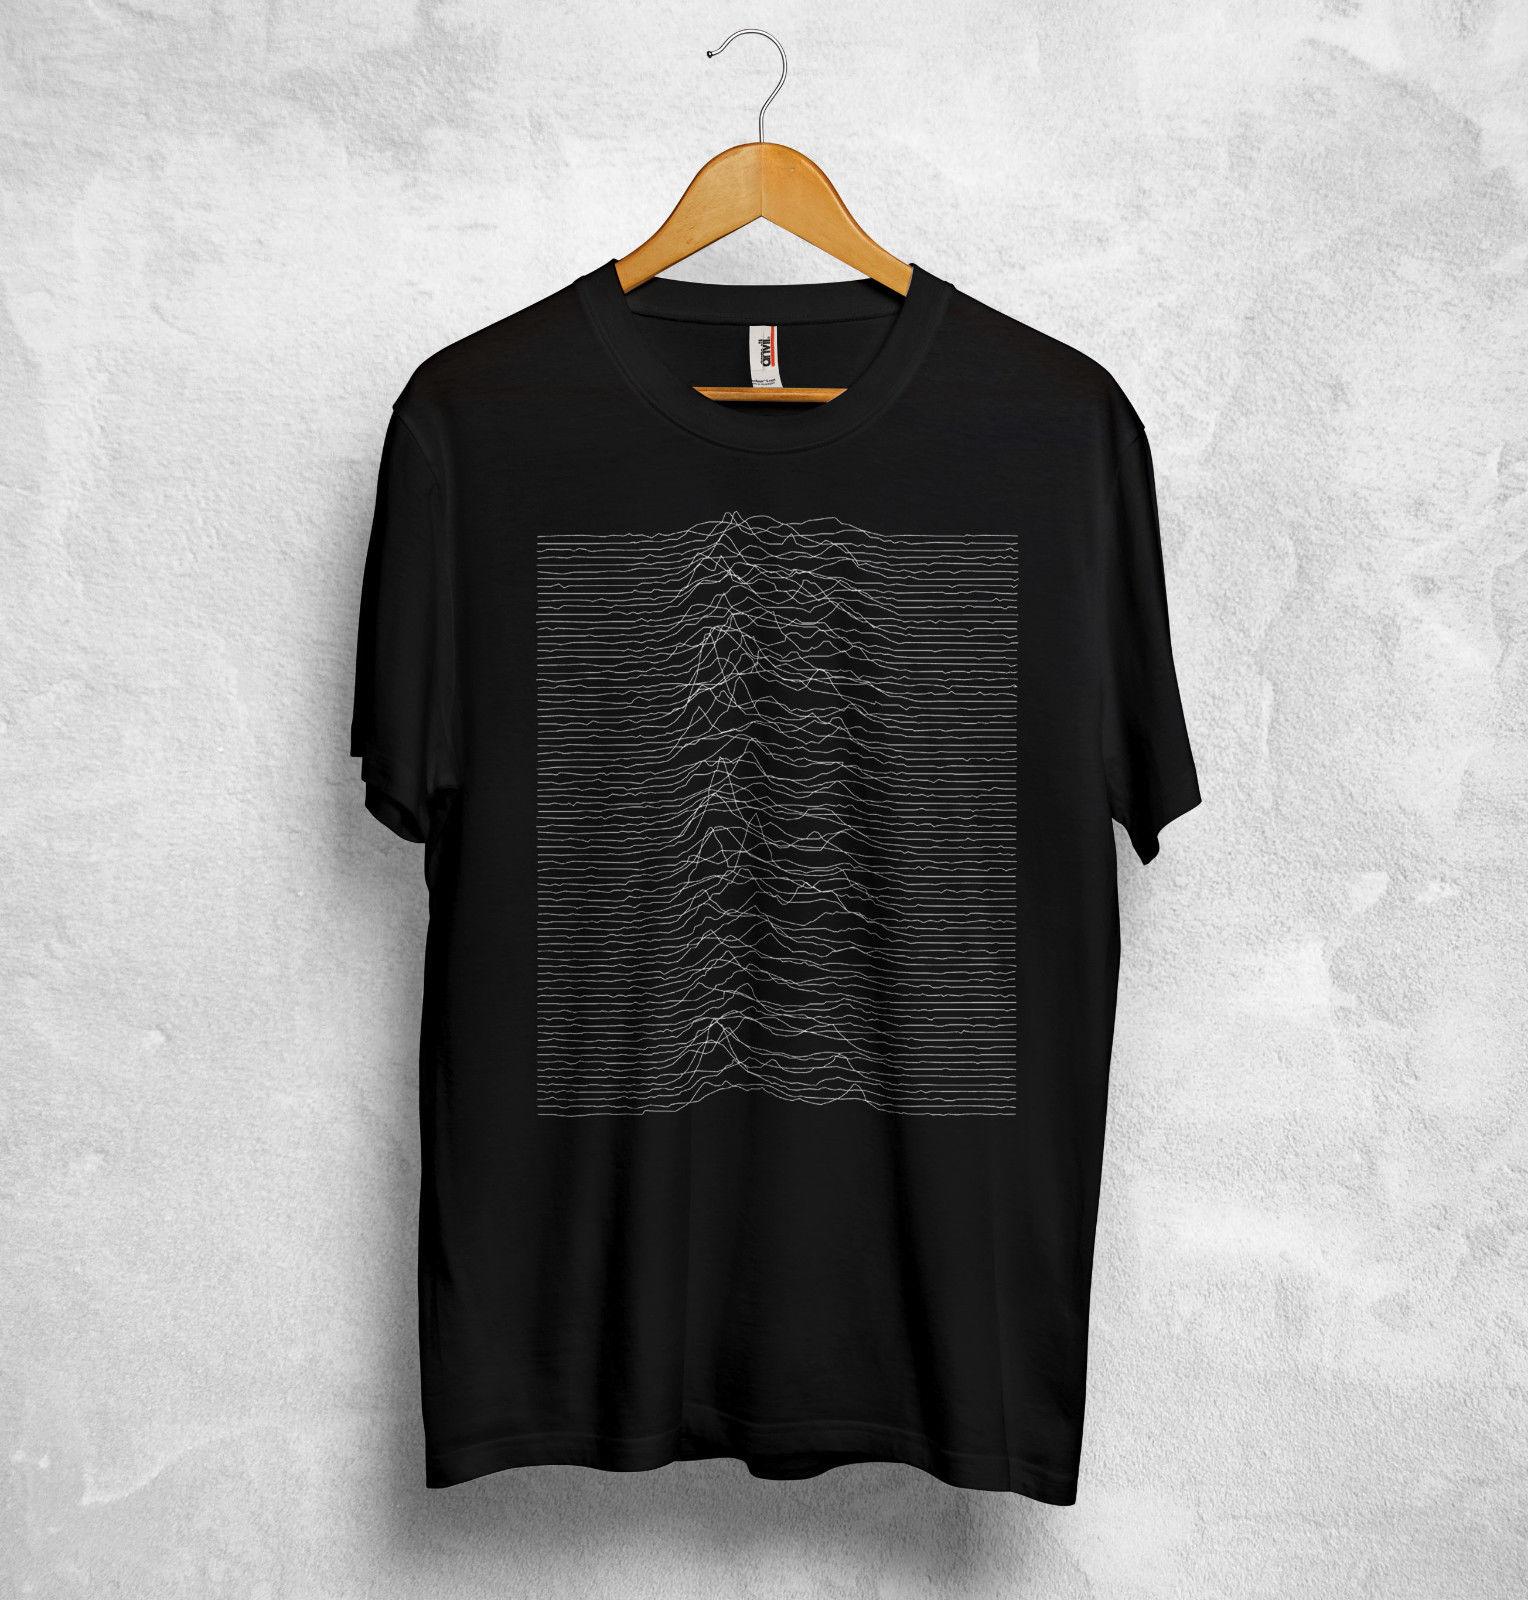 New fashion of shirt 99